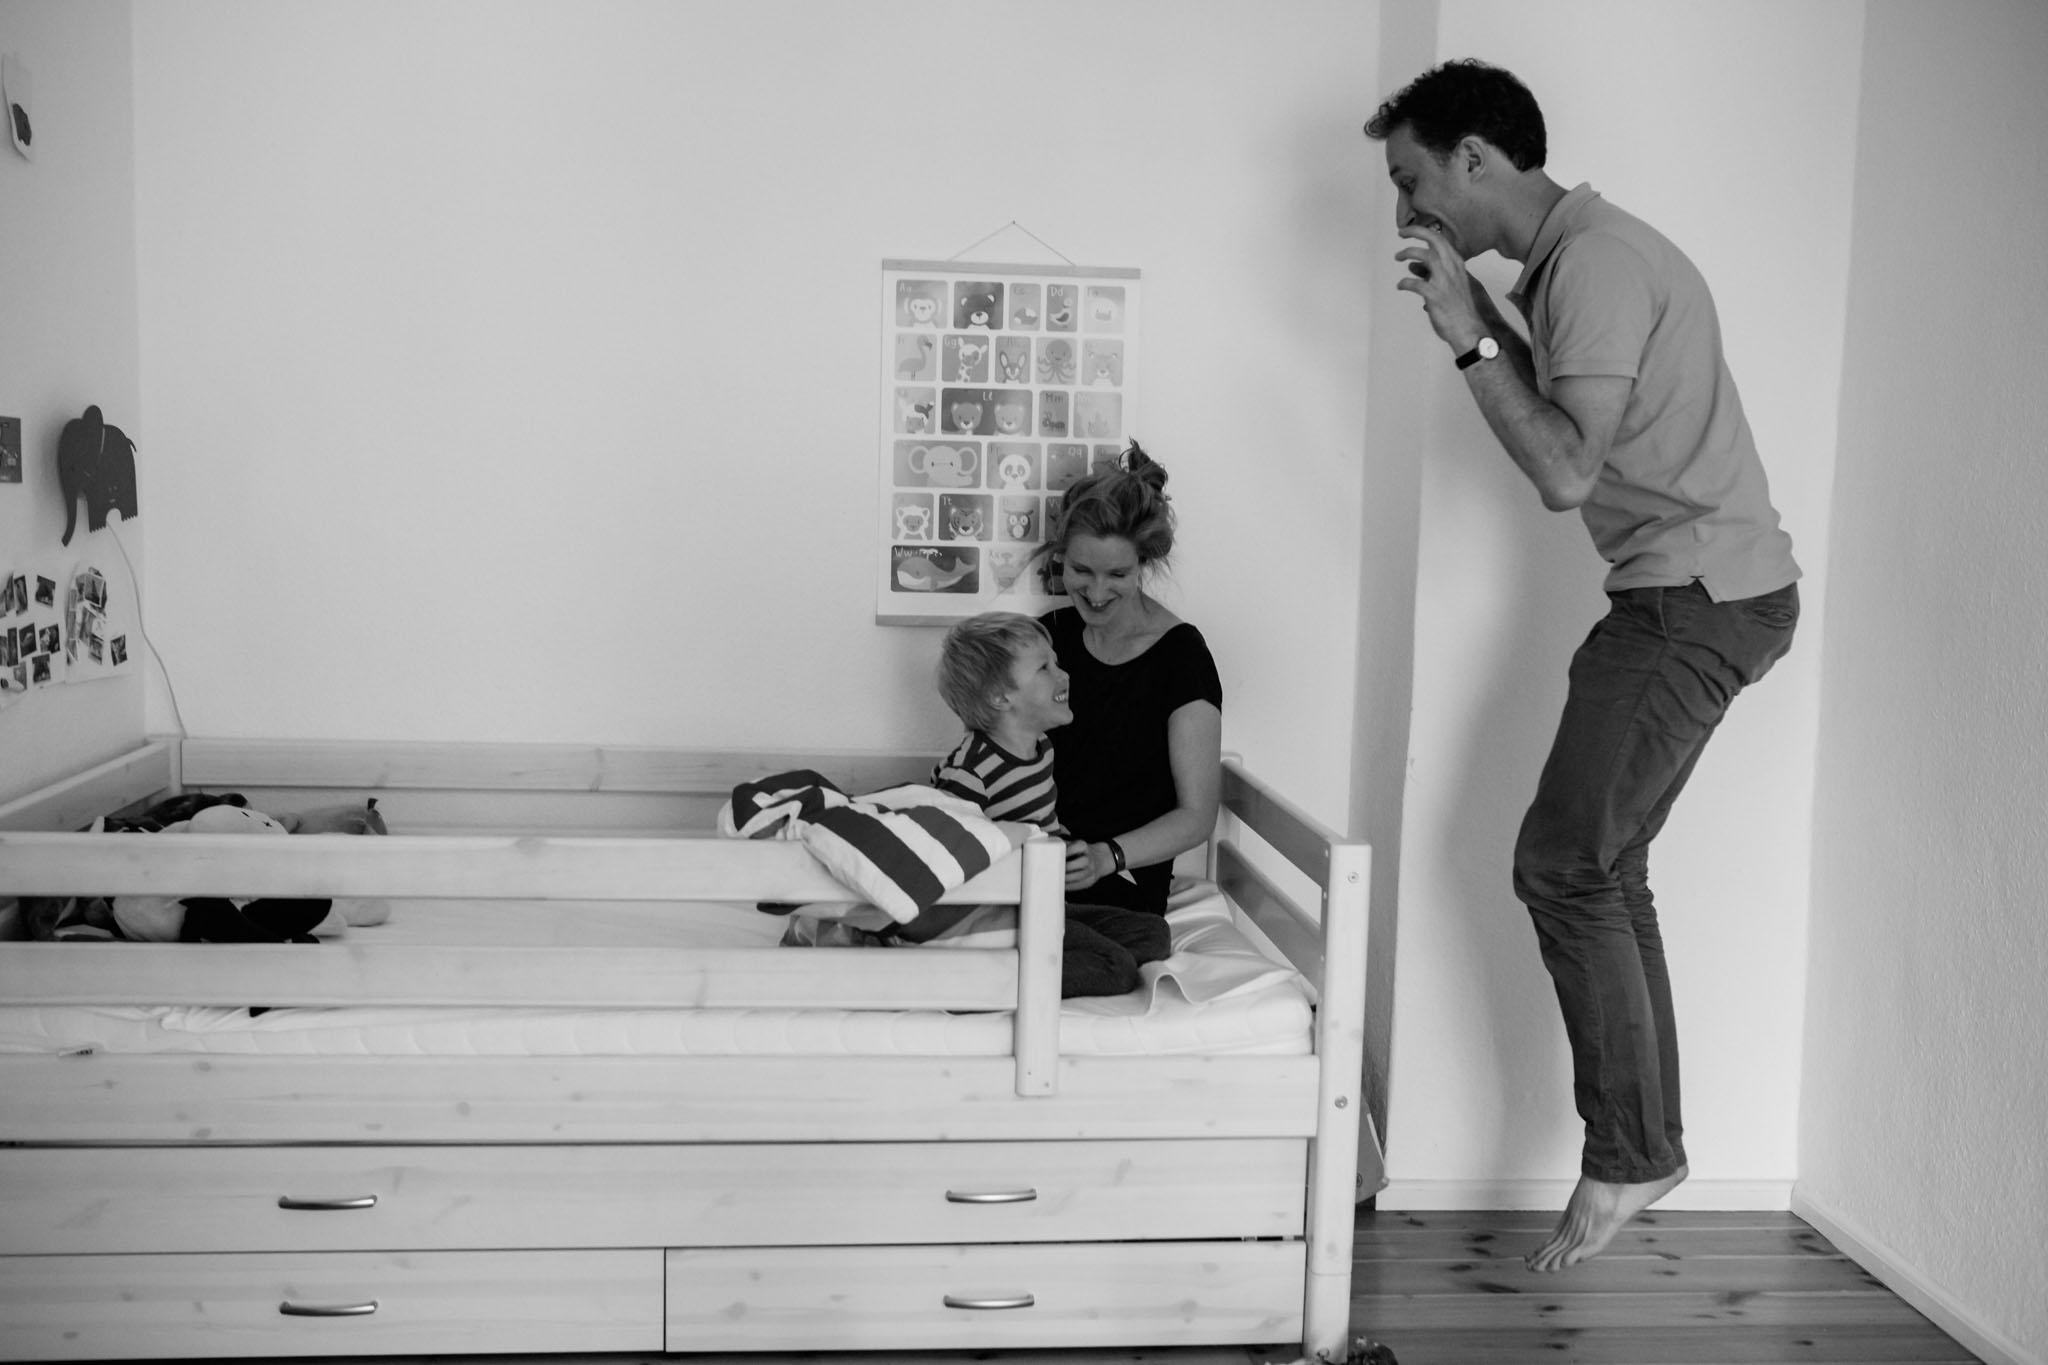 foto-homestory-familie-reportage-berlin